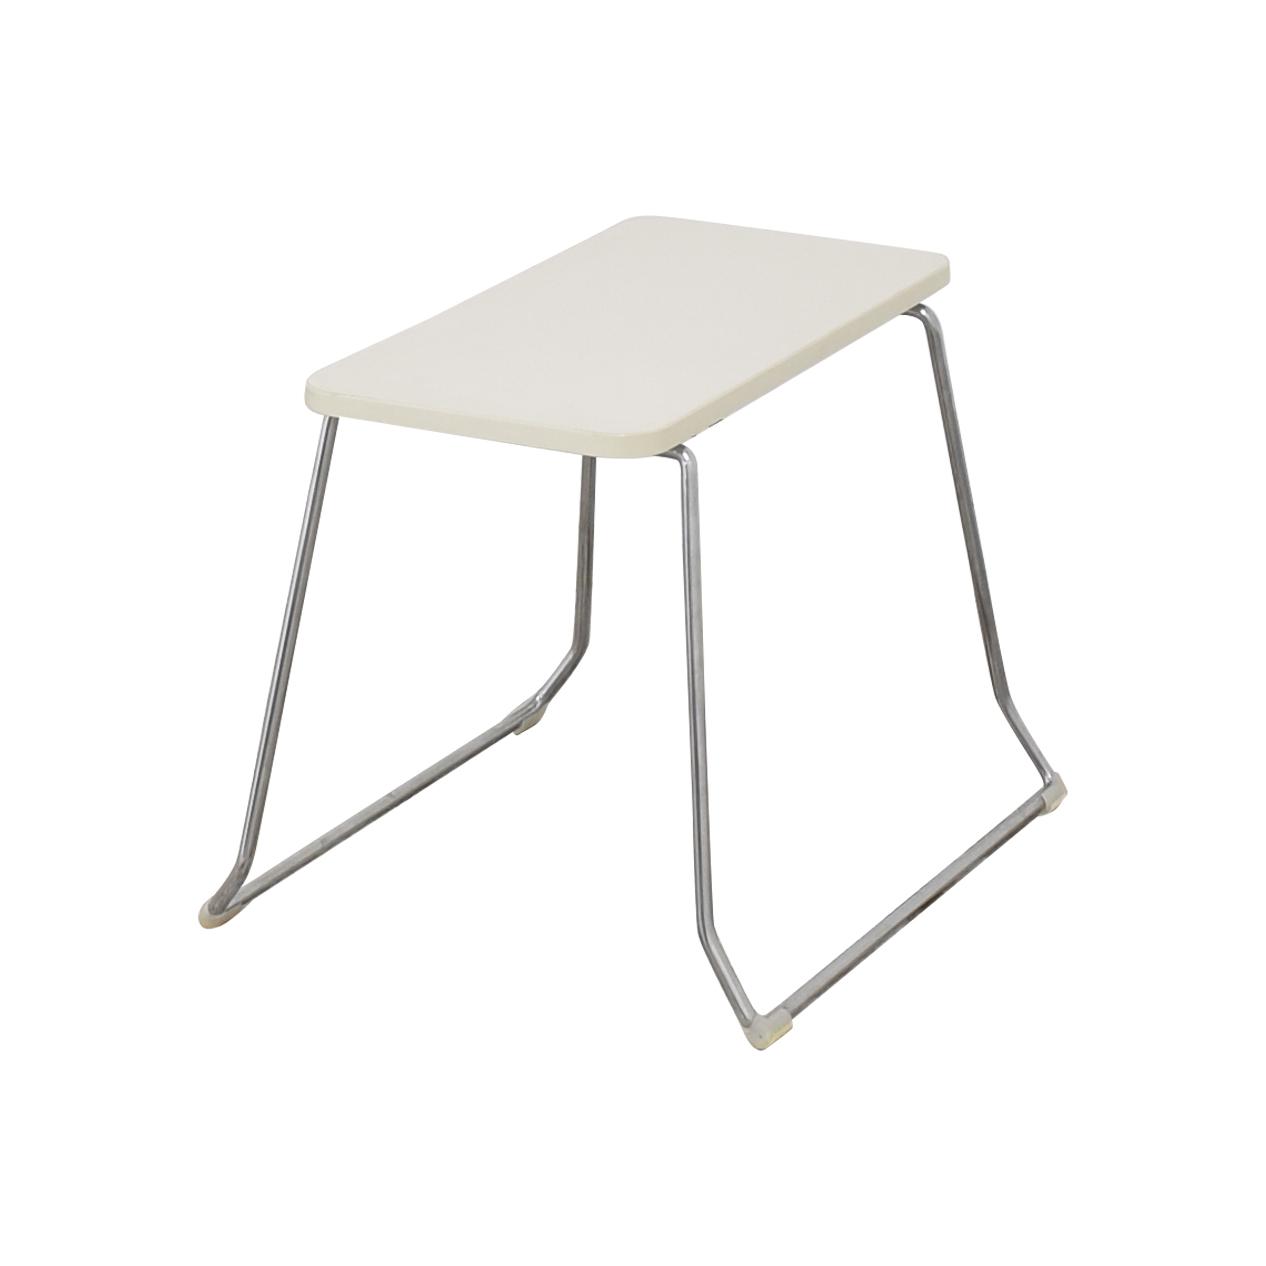 Koleksiyon Koleksiyion Asanda End Table used